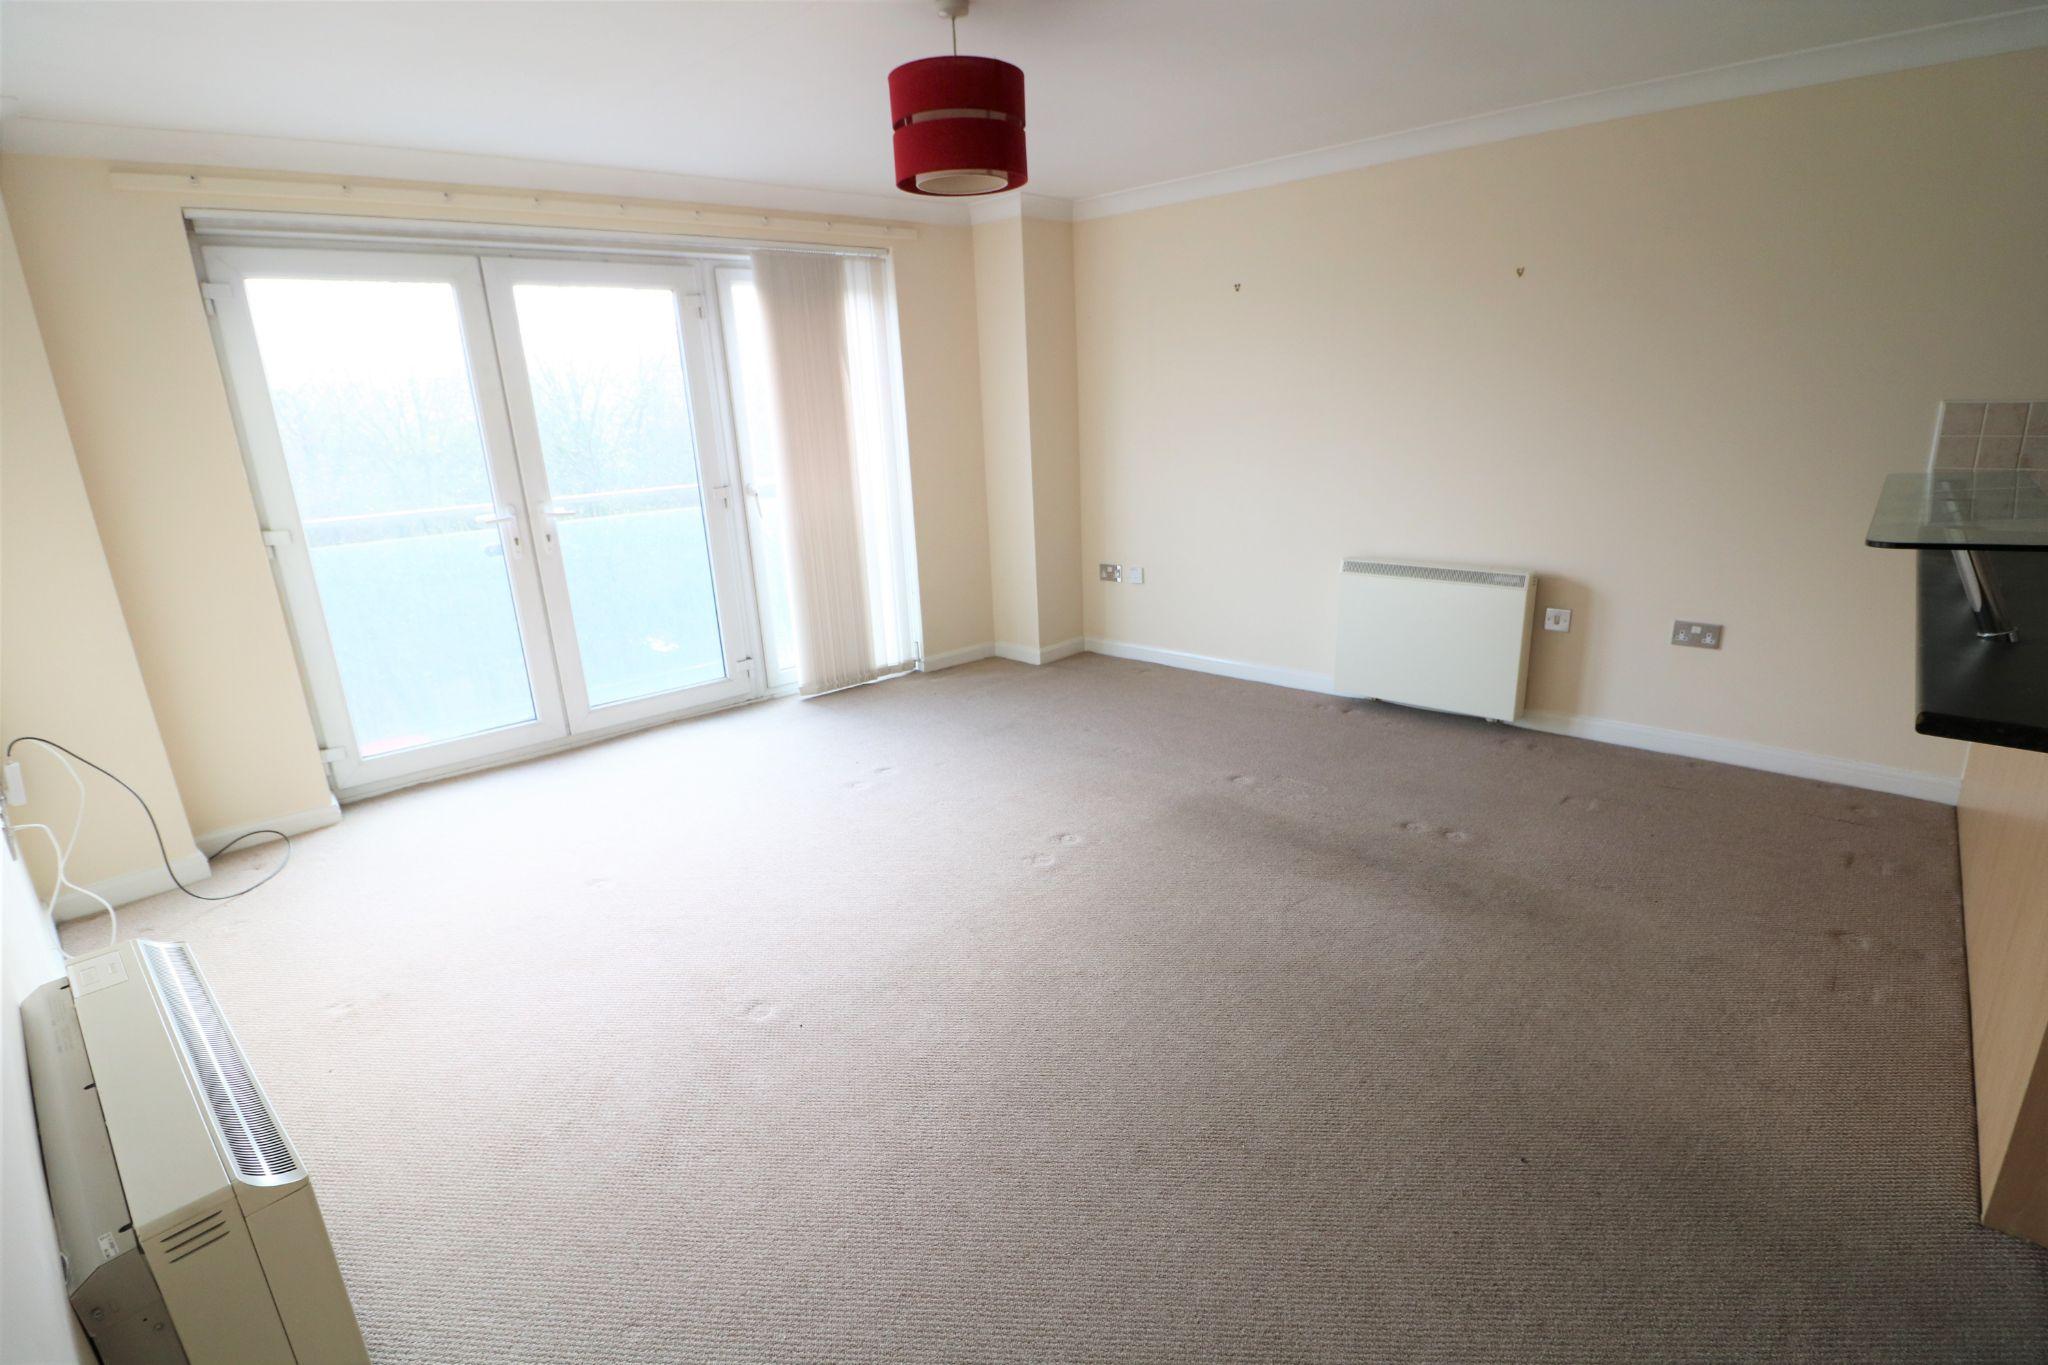 2 Bedroom Ground Floor Flat/apartment To Rent - Photograph 4